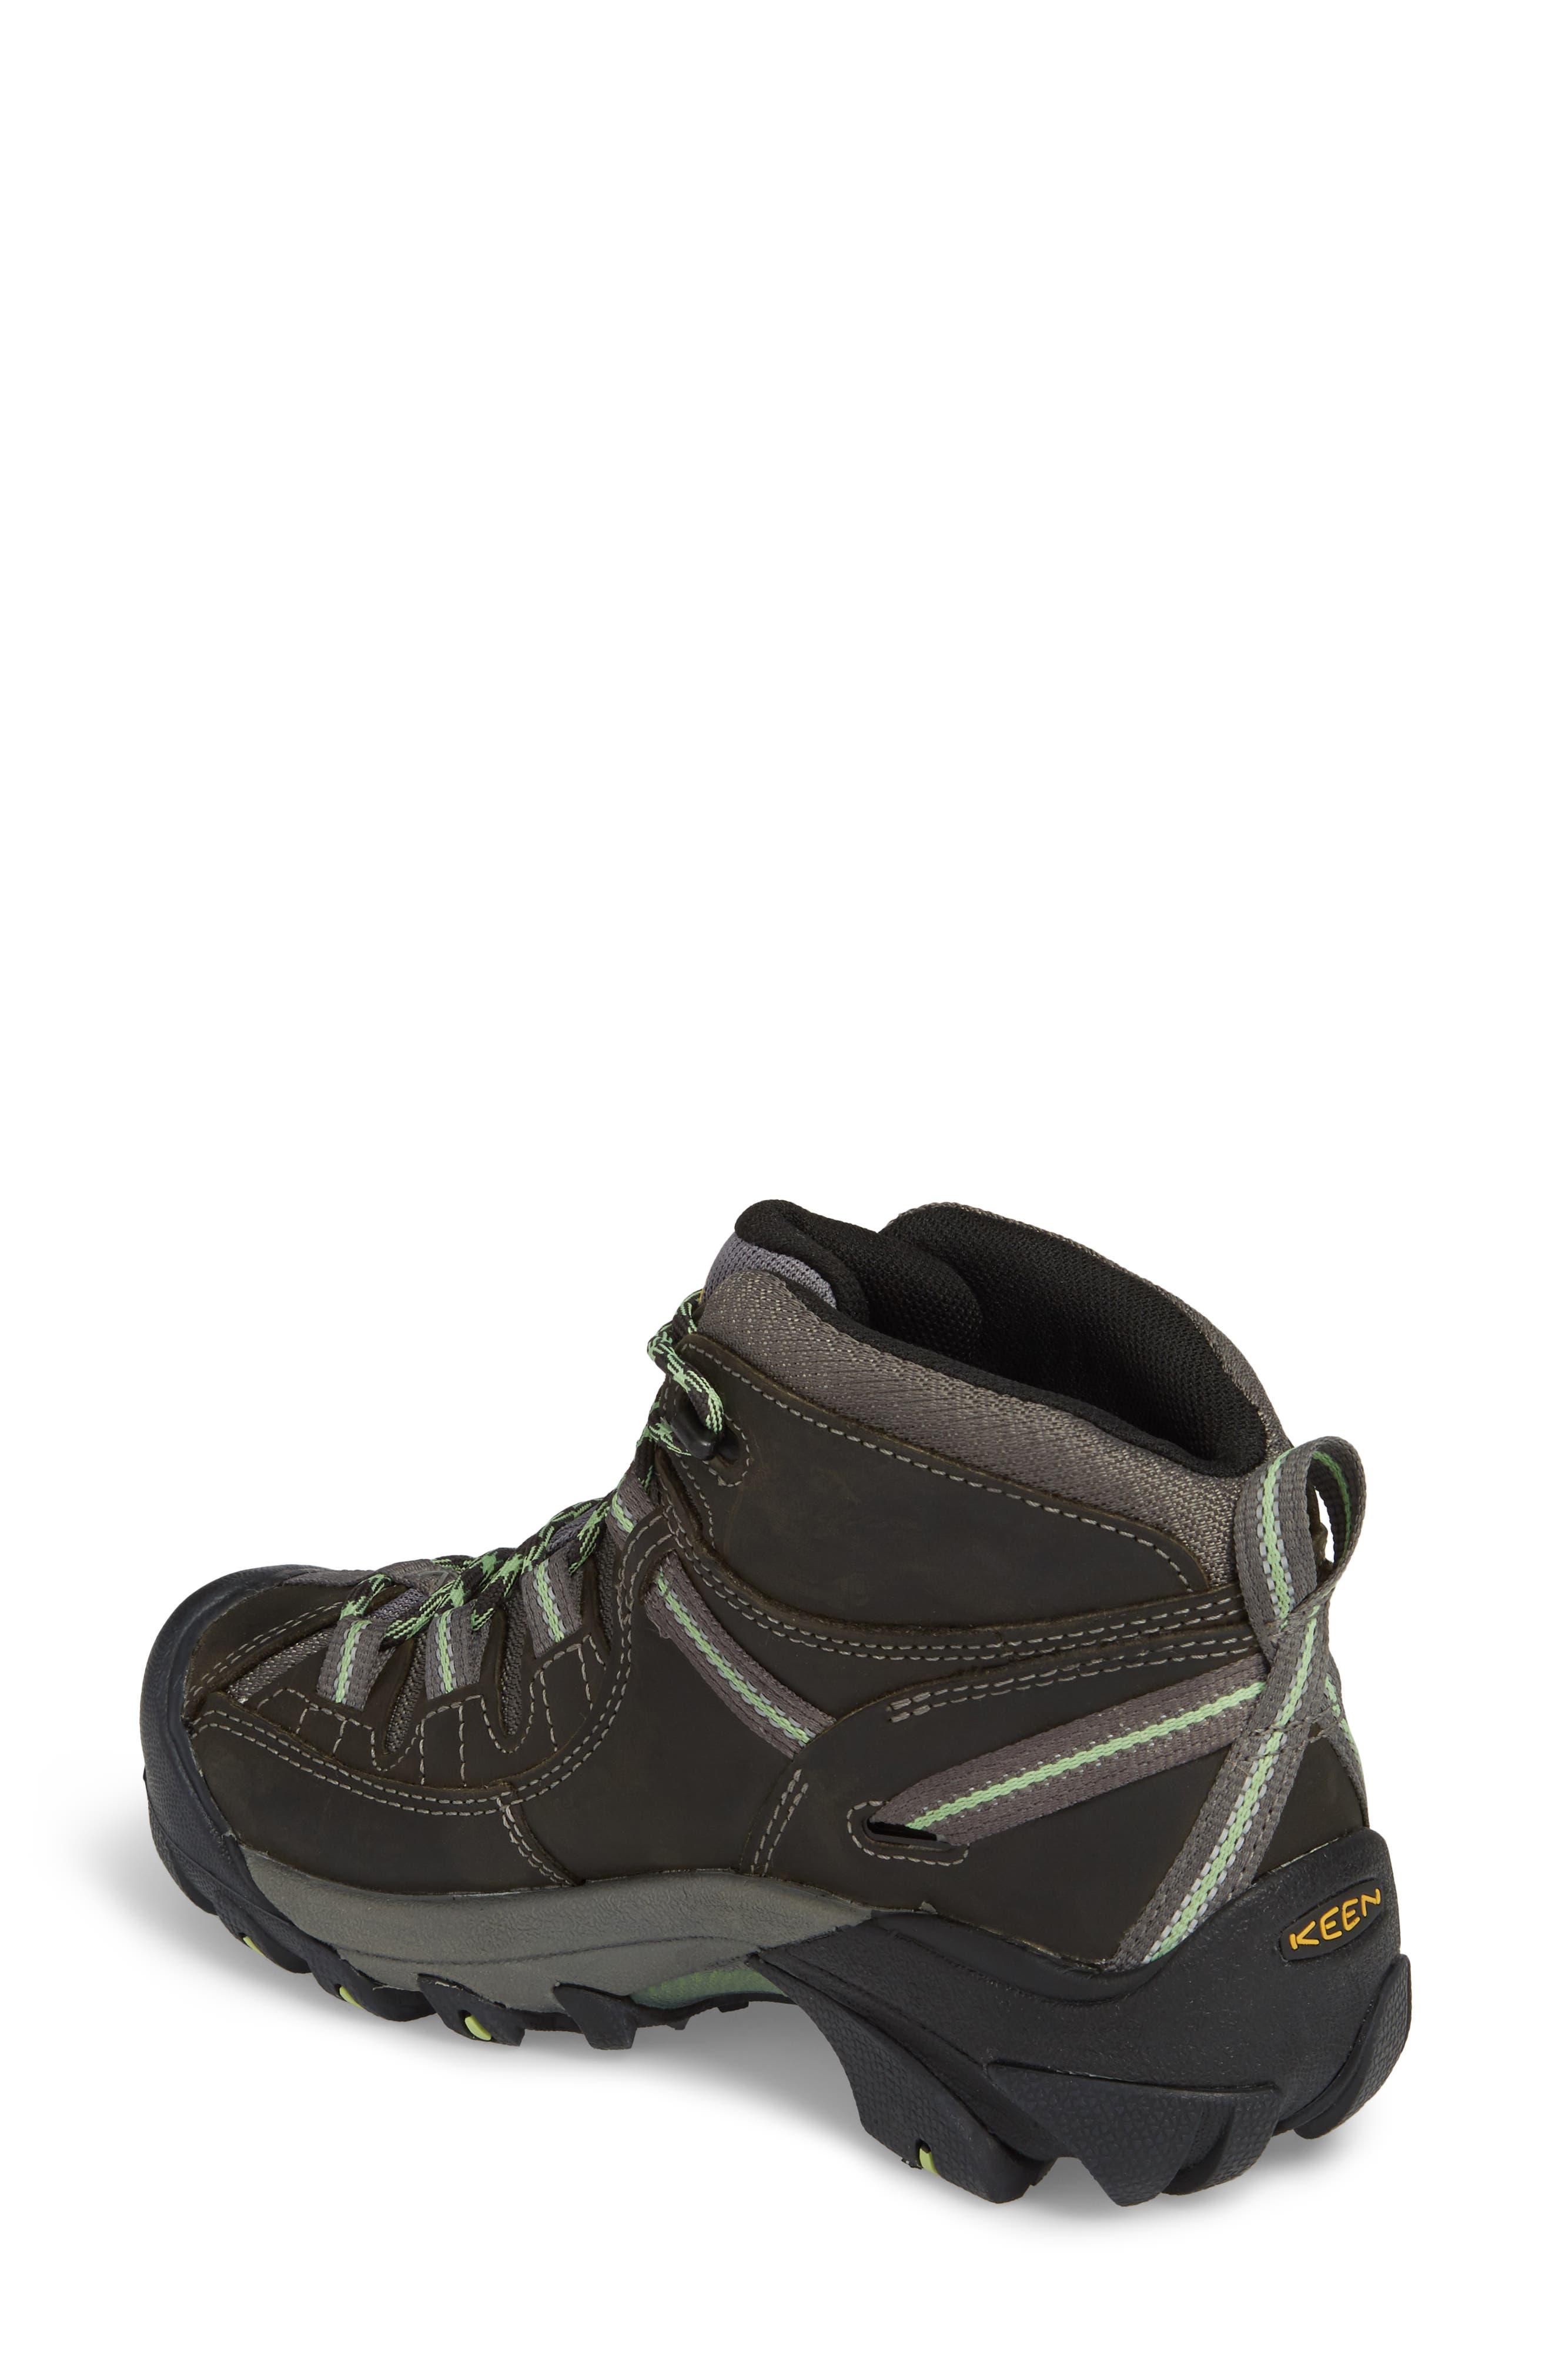 Alternate Image 2  - Keen Targhee II Mid Waterproof Hiking Boot (Women)